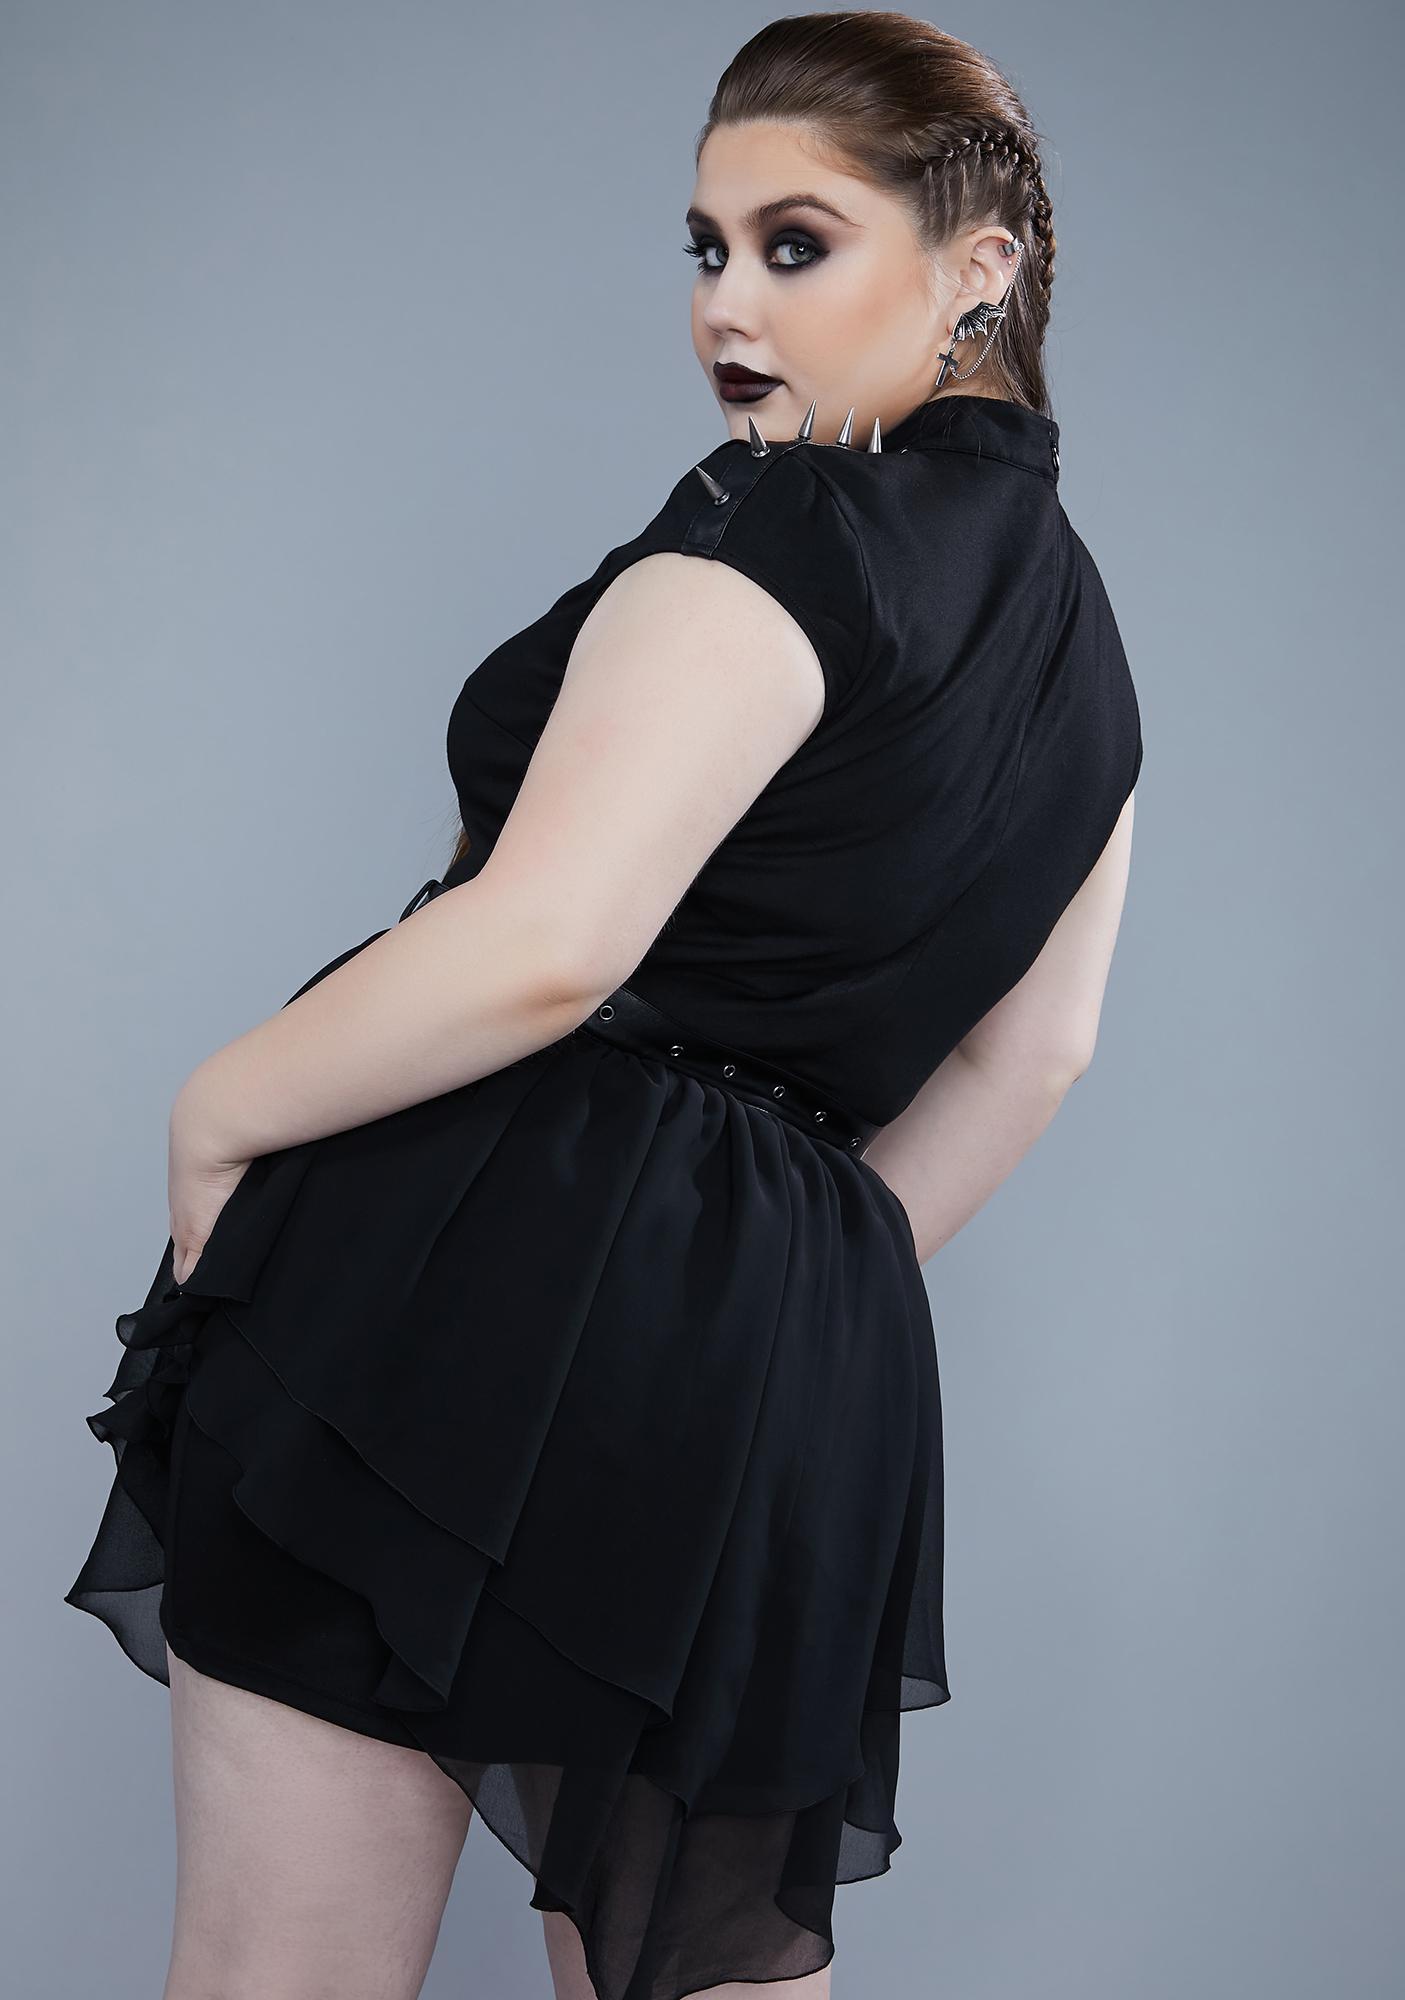 Widow My Warrior Spirit Spiked Mini Dress